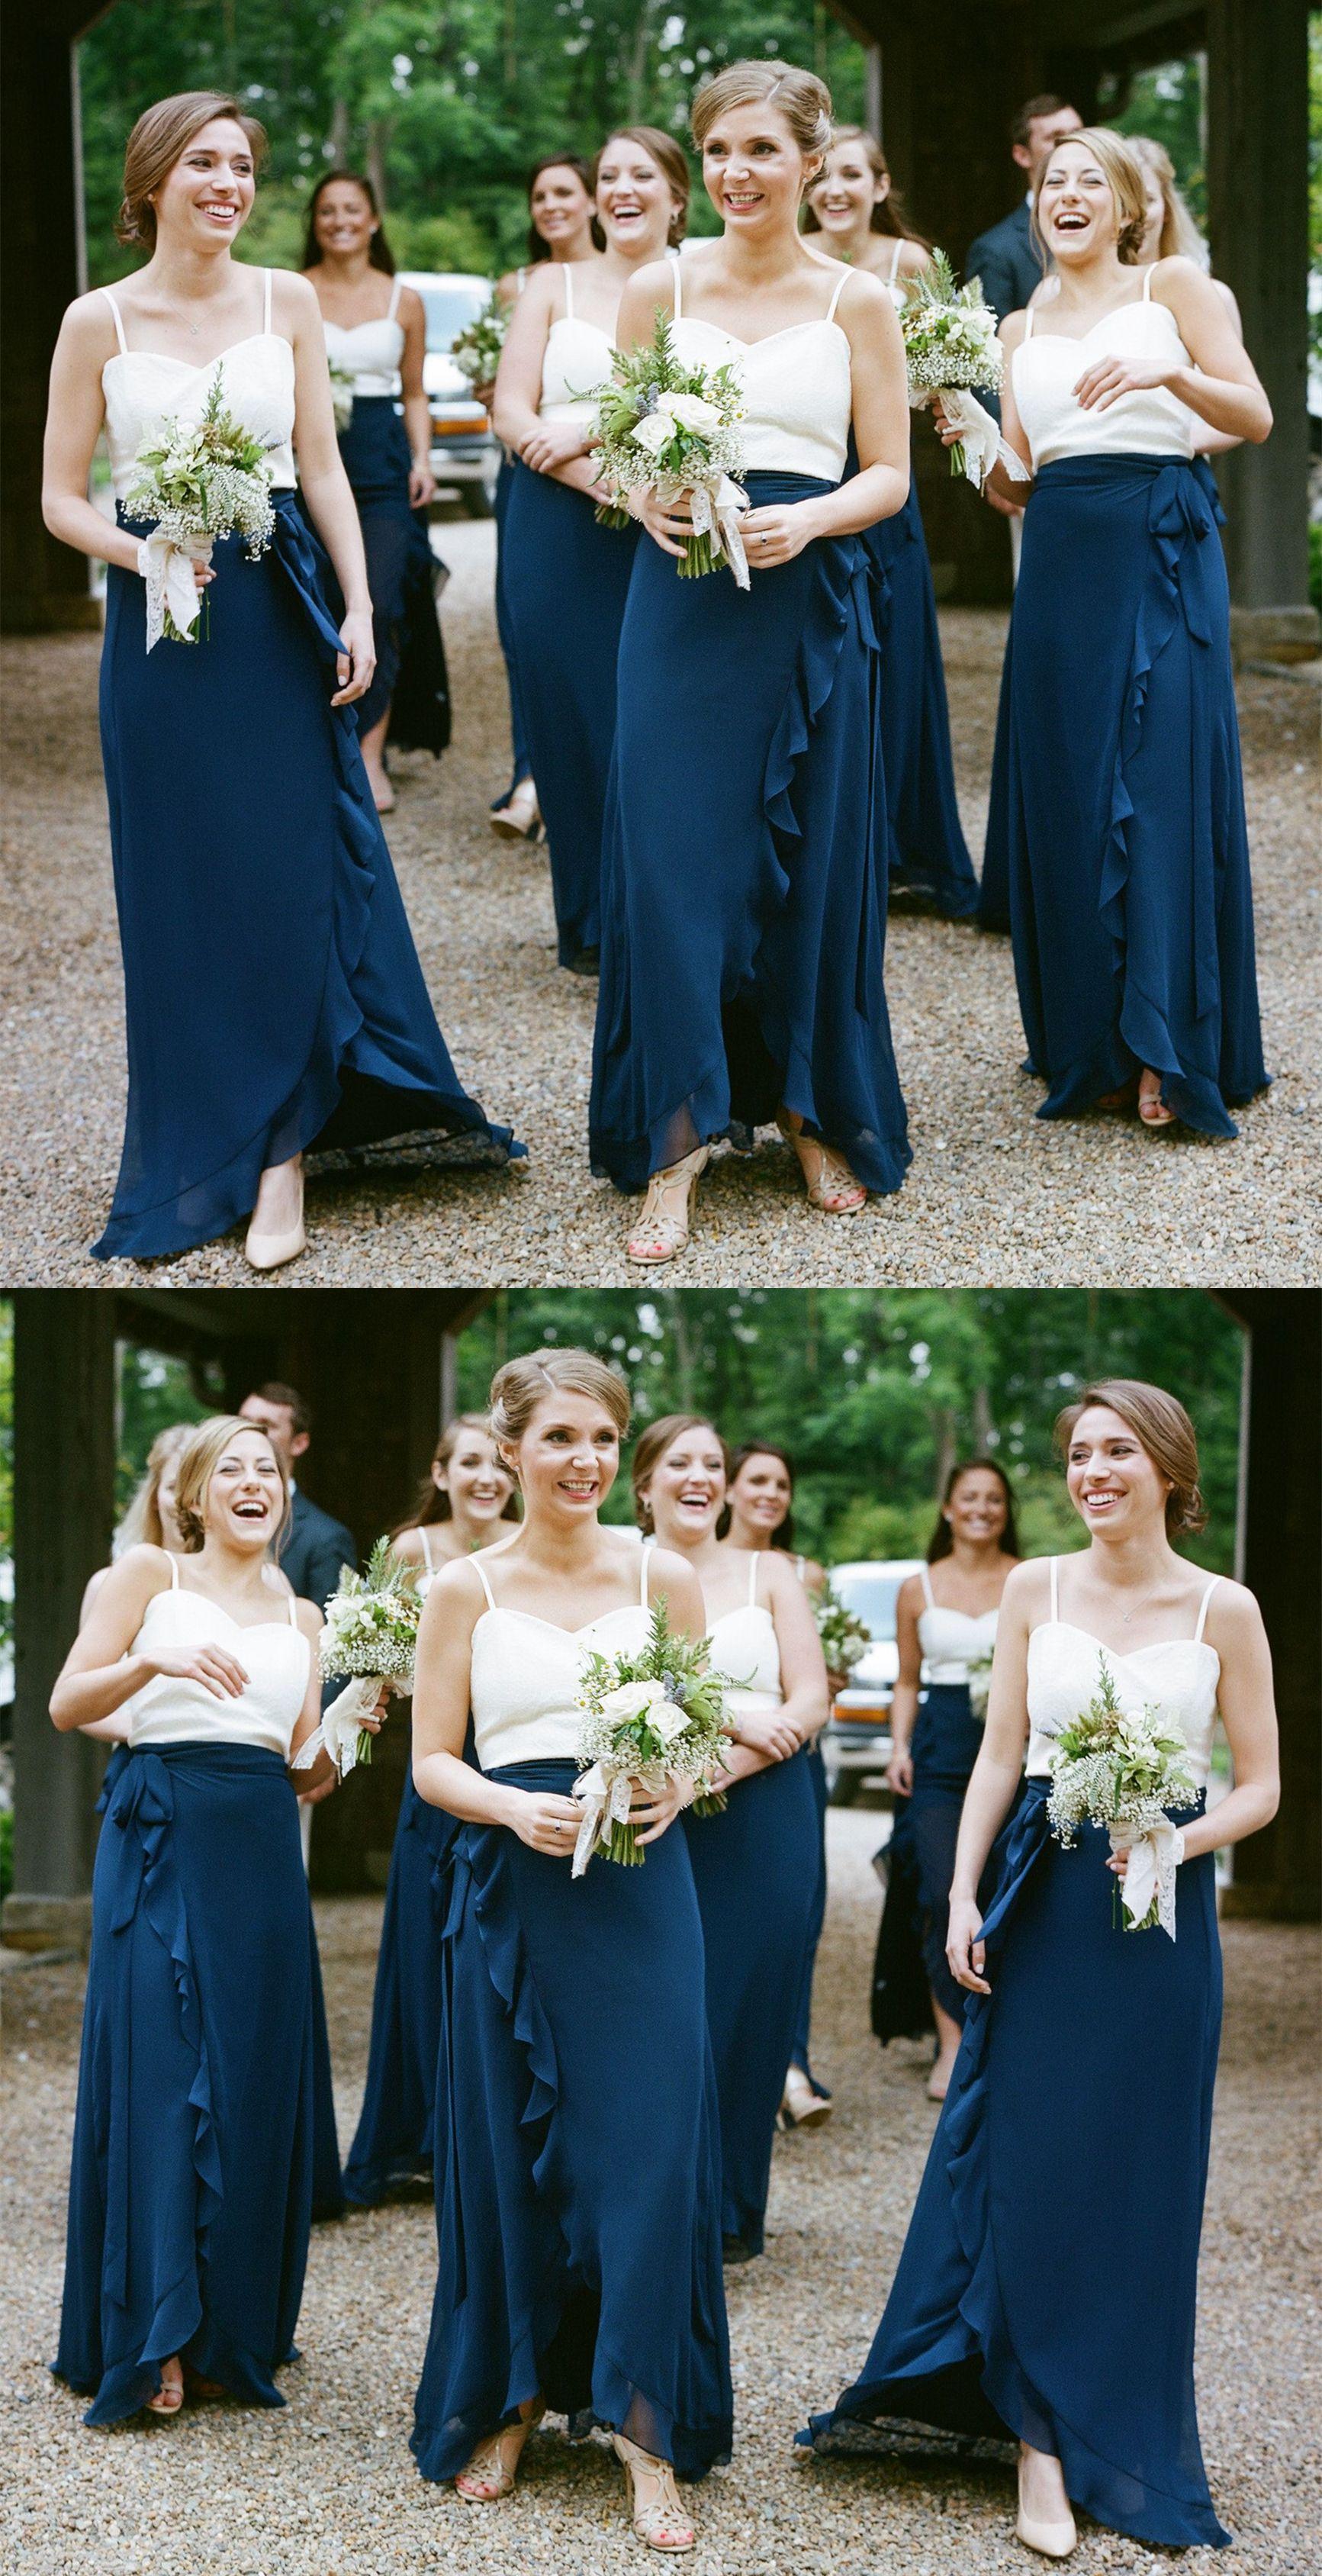 Aline spaghetti straps dark blue bridesmaid dress with ruffles